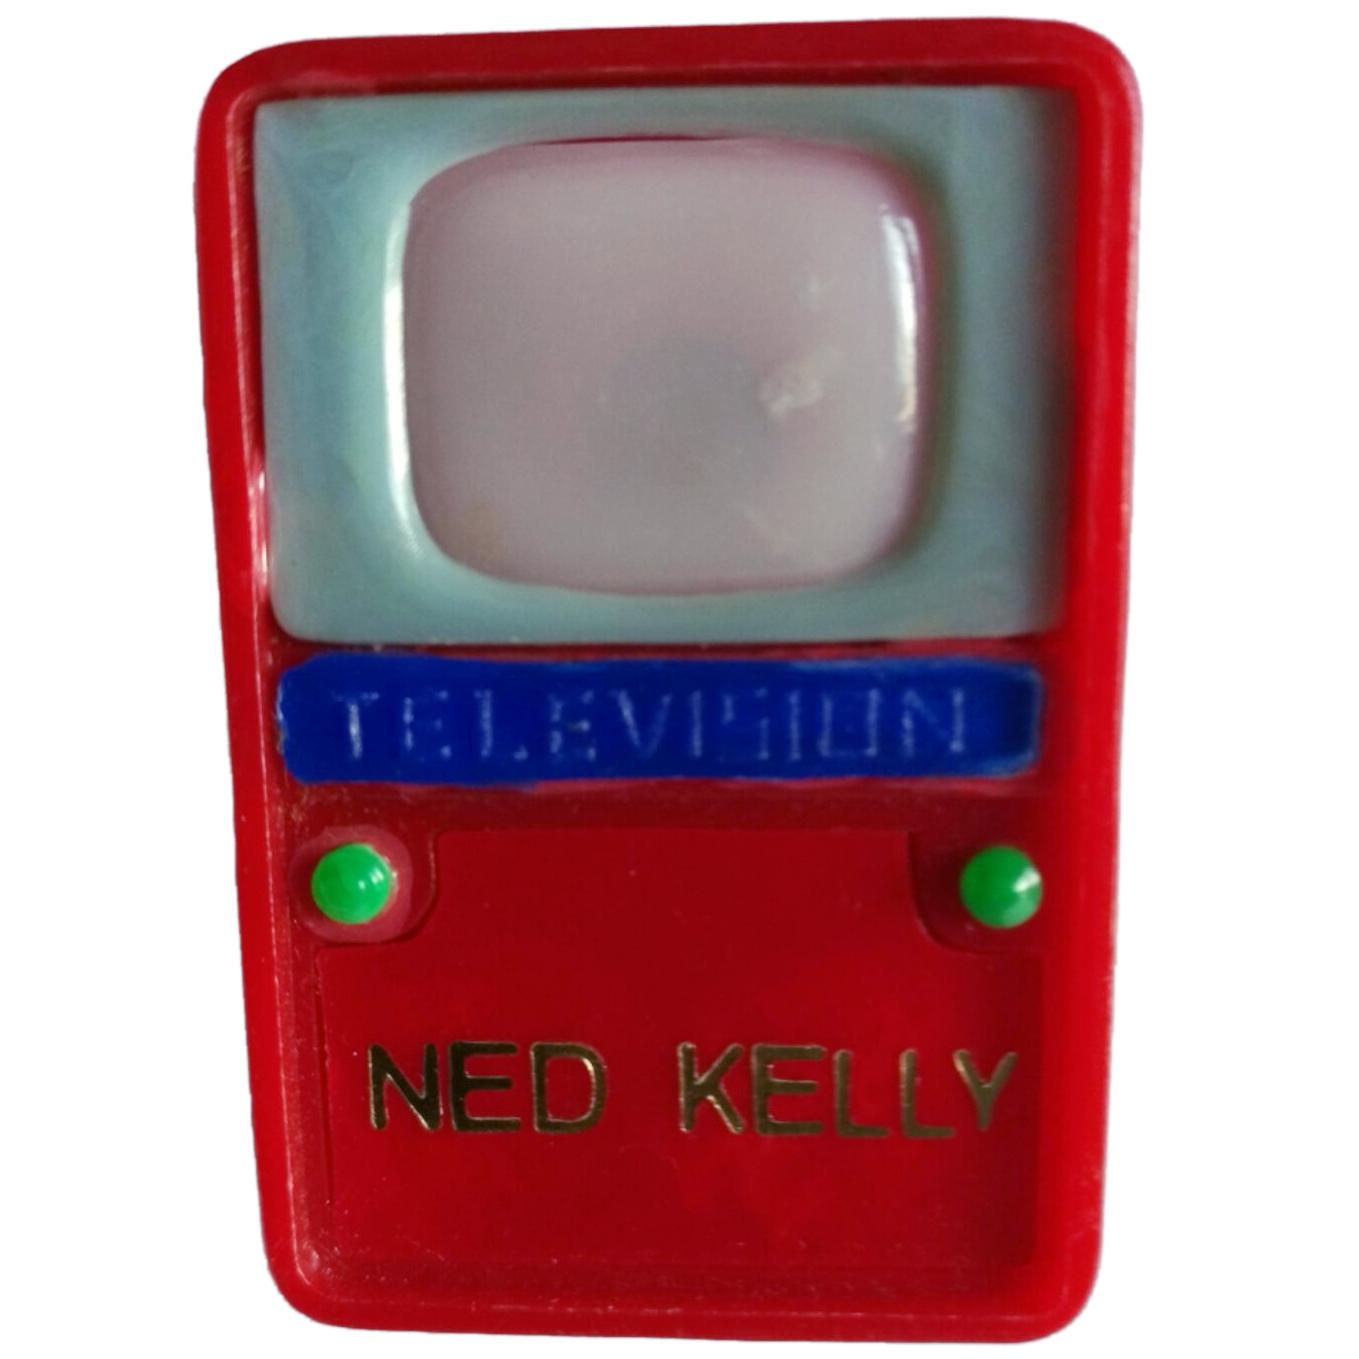 Ned-Kelly-TV-Toy